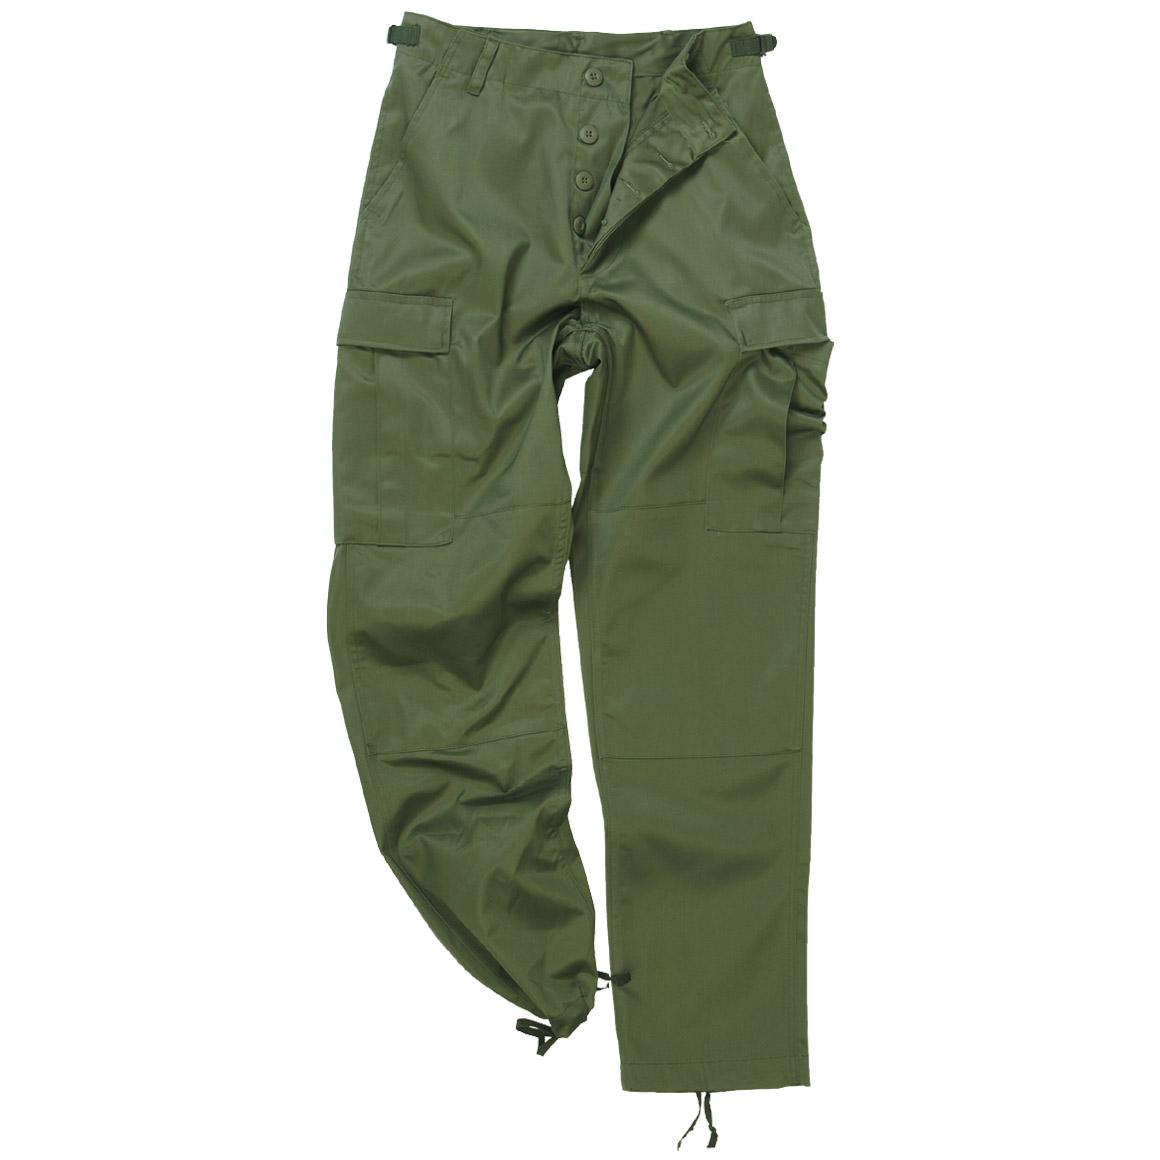 Mil Tec Bdu Ranger Combat Trousers Olive Bdu Military 1st